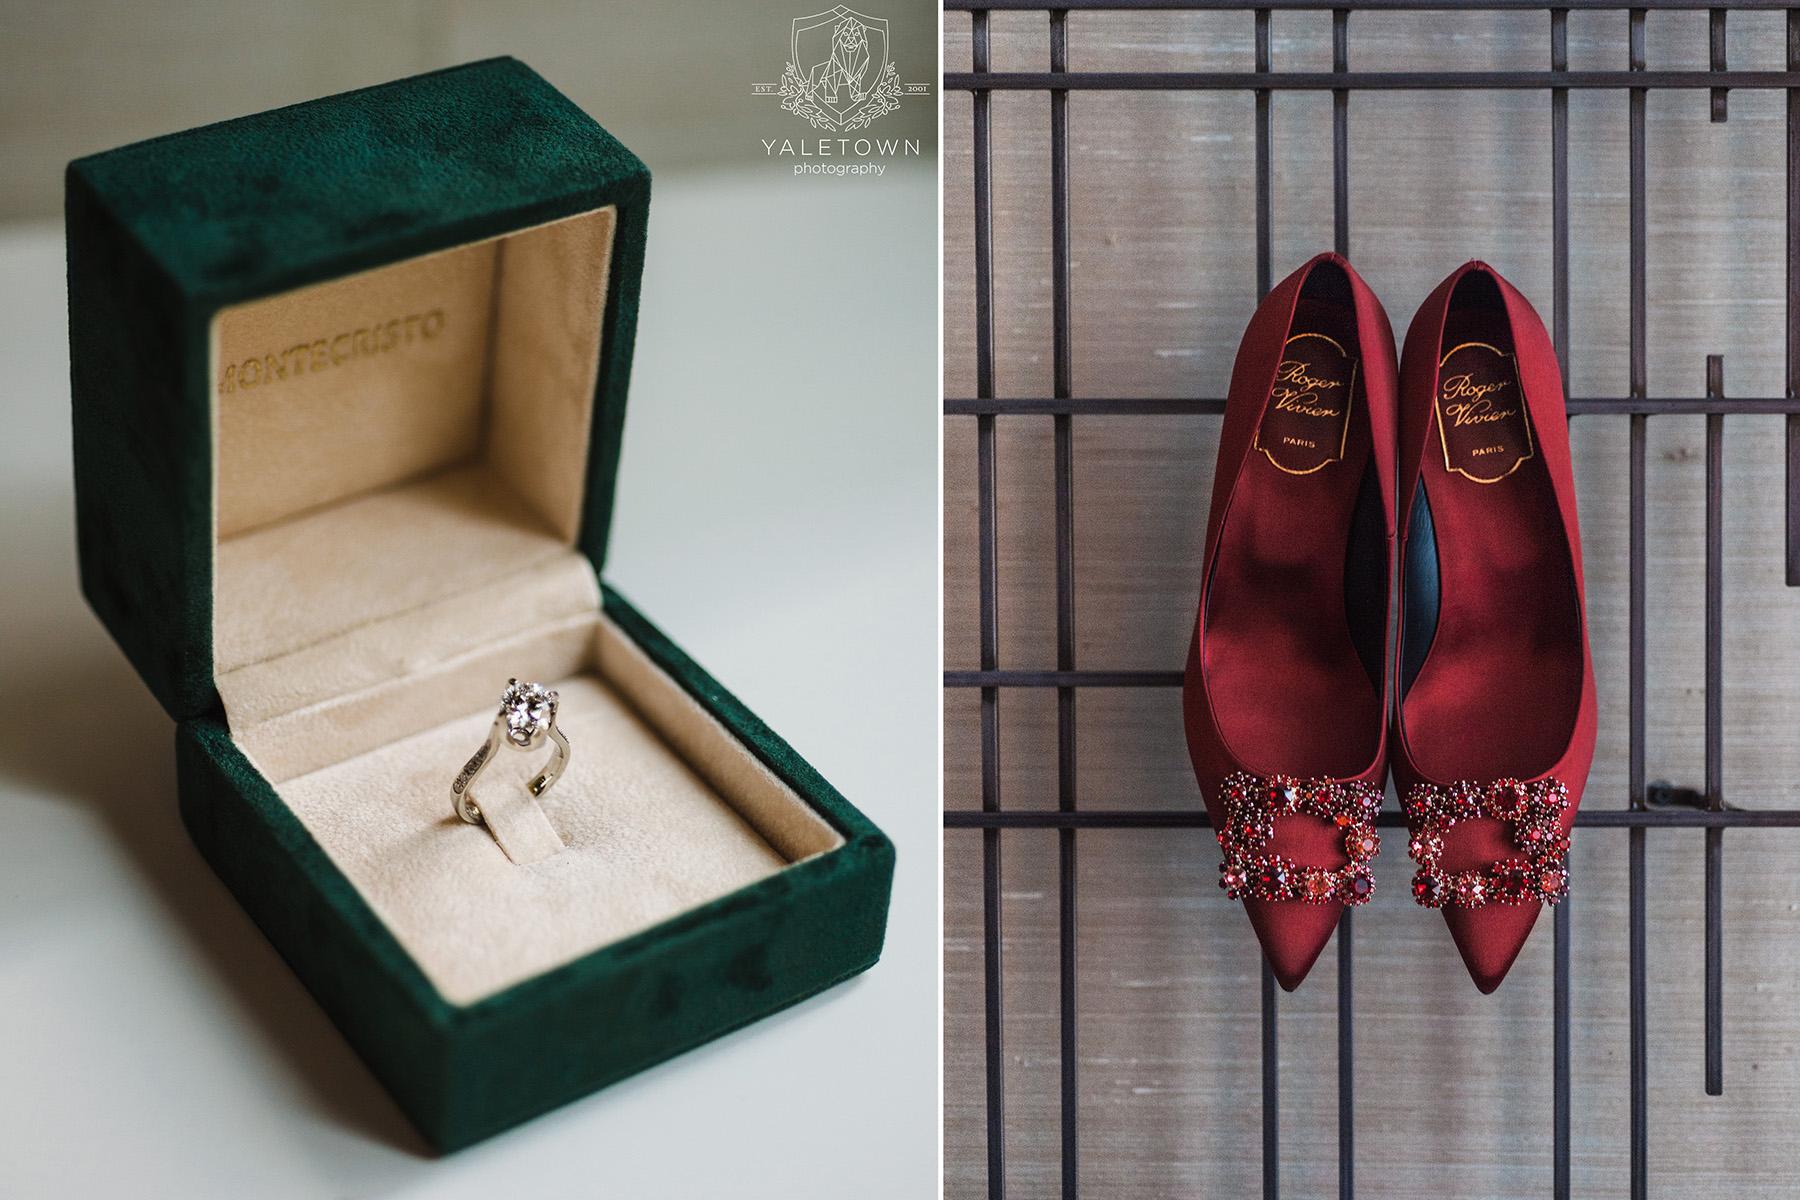 Roger-Vivier-Bridal-Shoes-Montecristo-Wedding-Ring-Rosewood-Hotel-Georgia-Vancouver-Wedding-Yaletown-Photography-photo